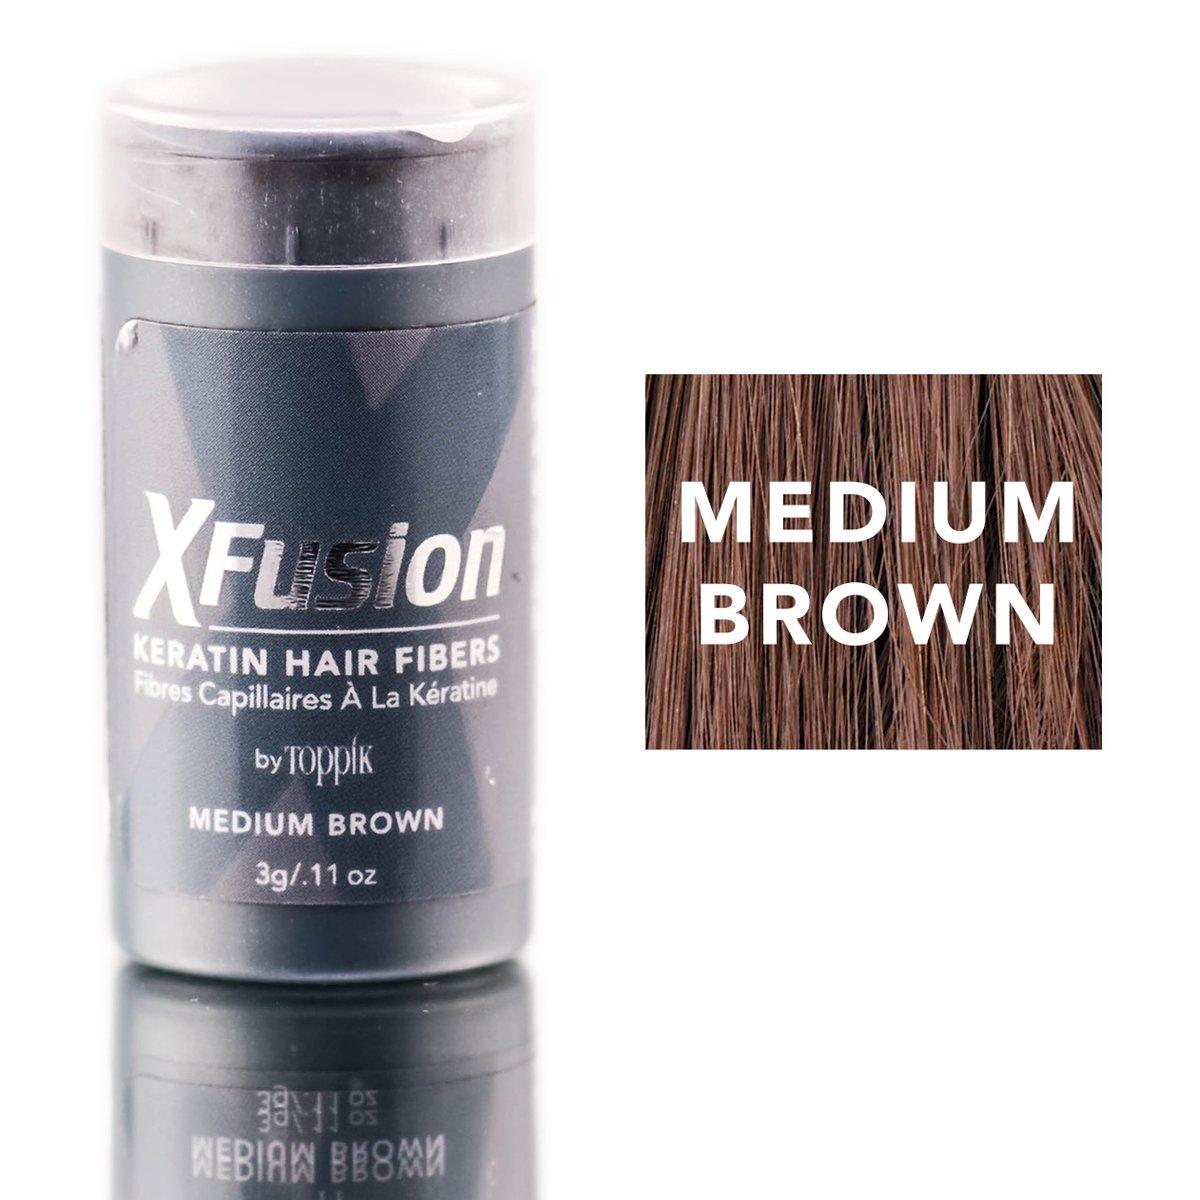 XFusion Keratin Hair Fibers, Medium Brown, Travel Size, 3g (0.11 OZ)